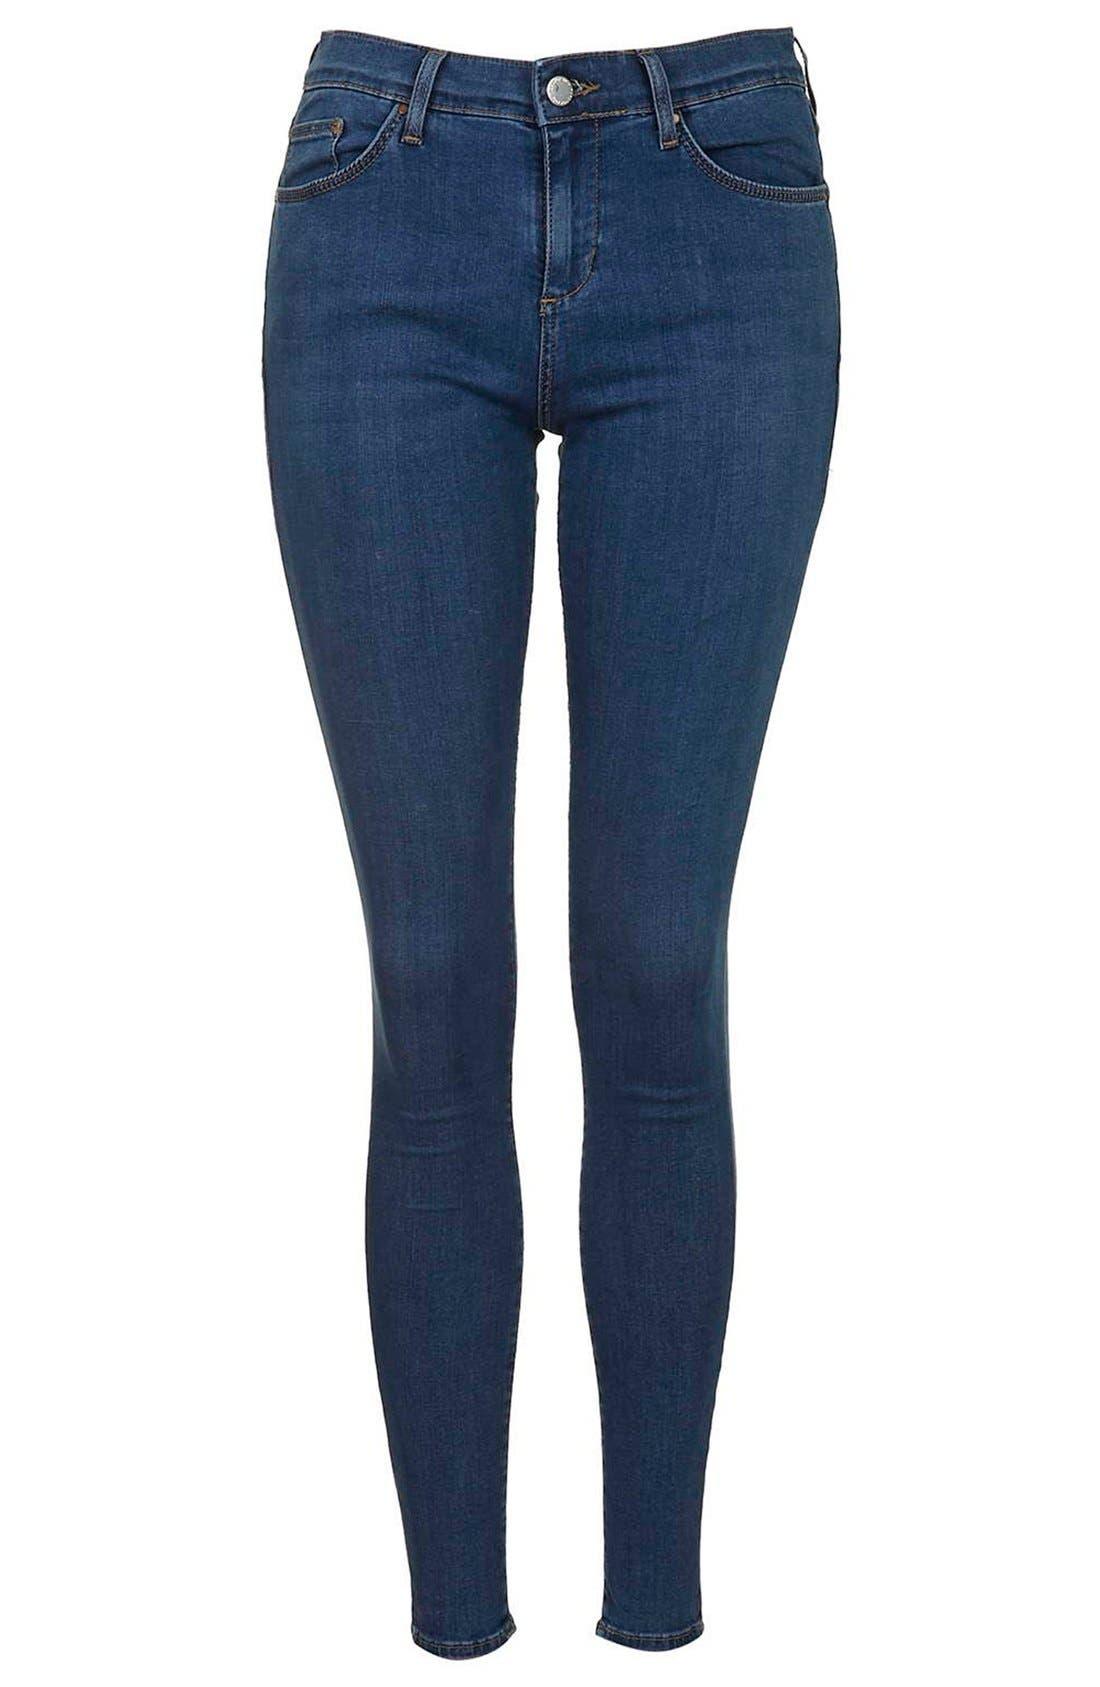 Alternate Image 3  - Topshop Moto 'Leigh' Skinny Jeans (Mid Denim) (Regular & Short)